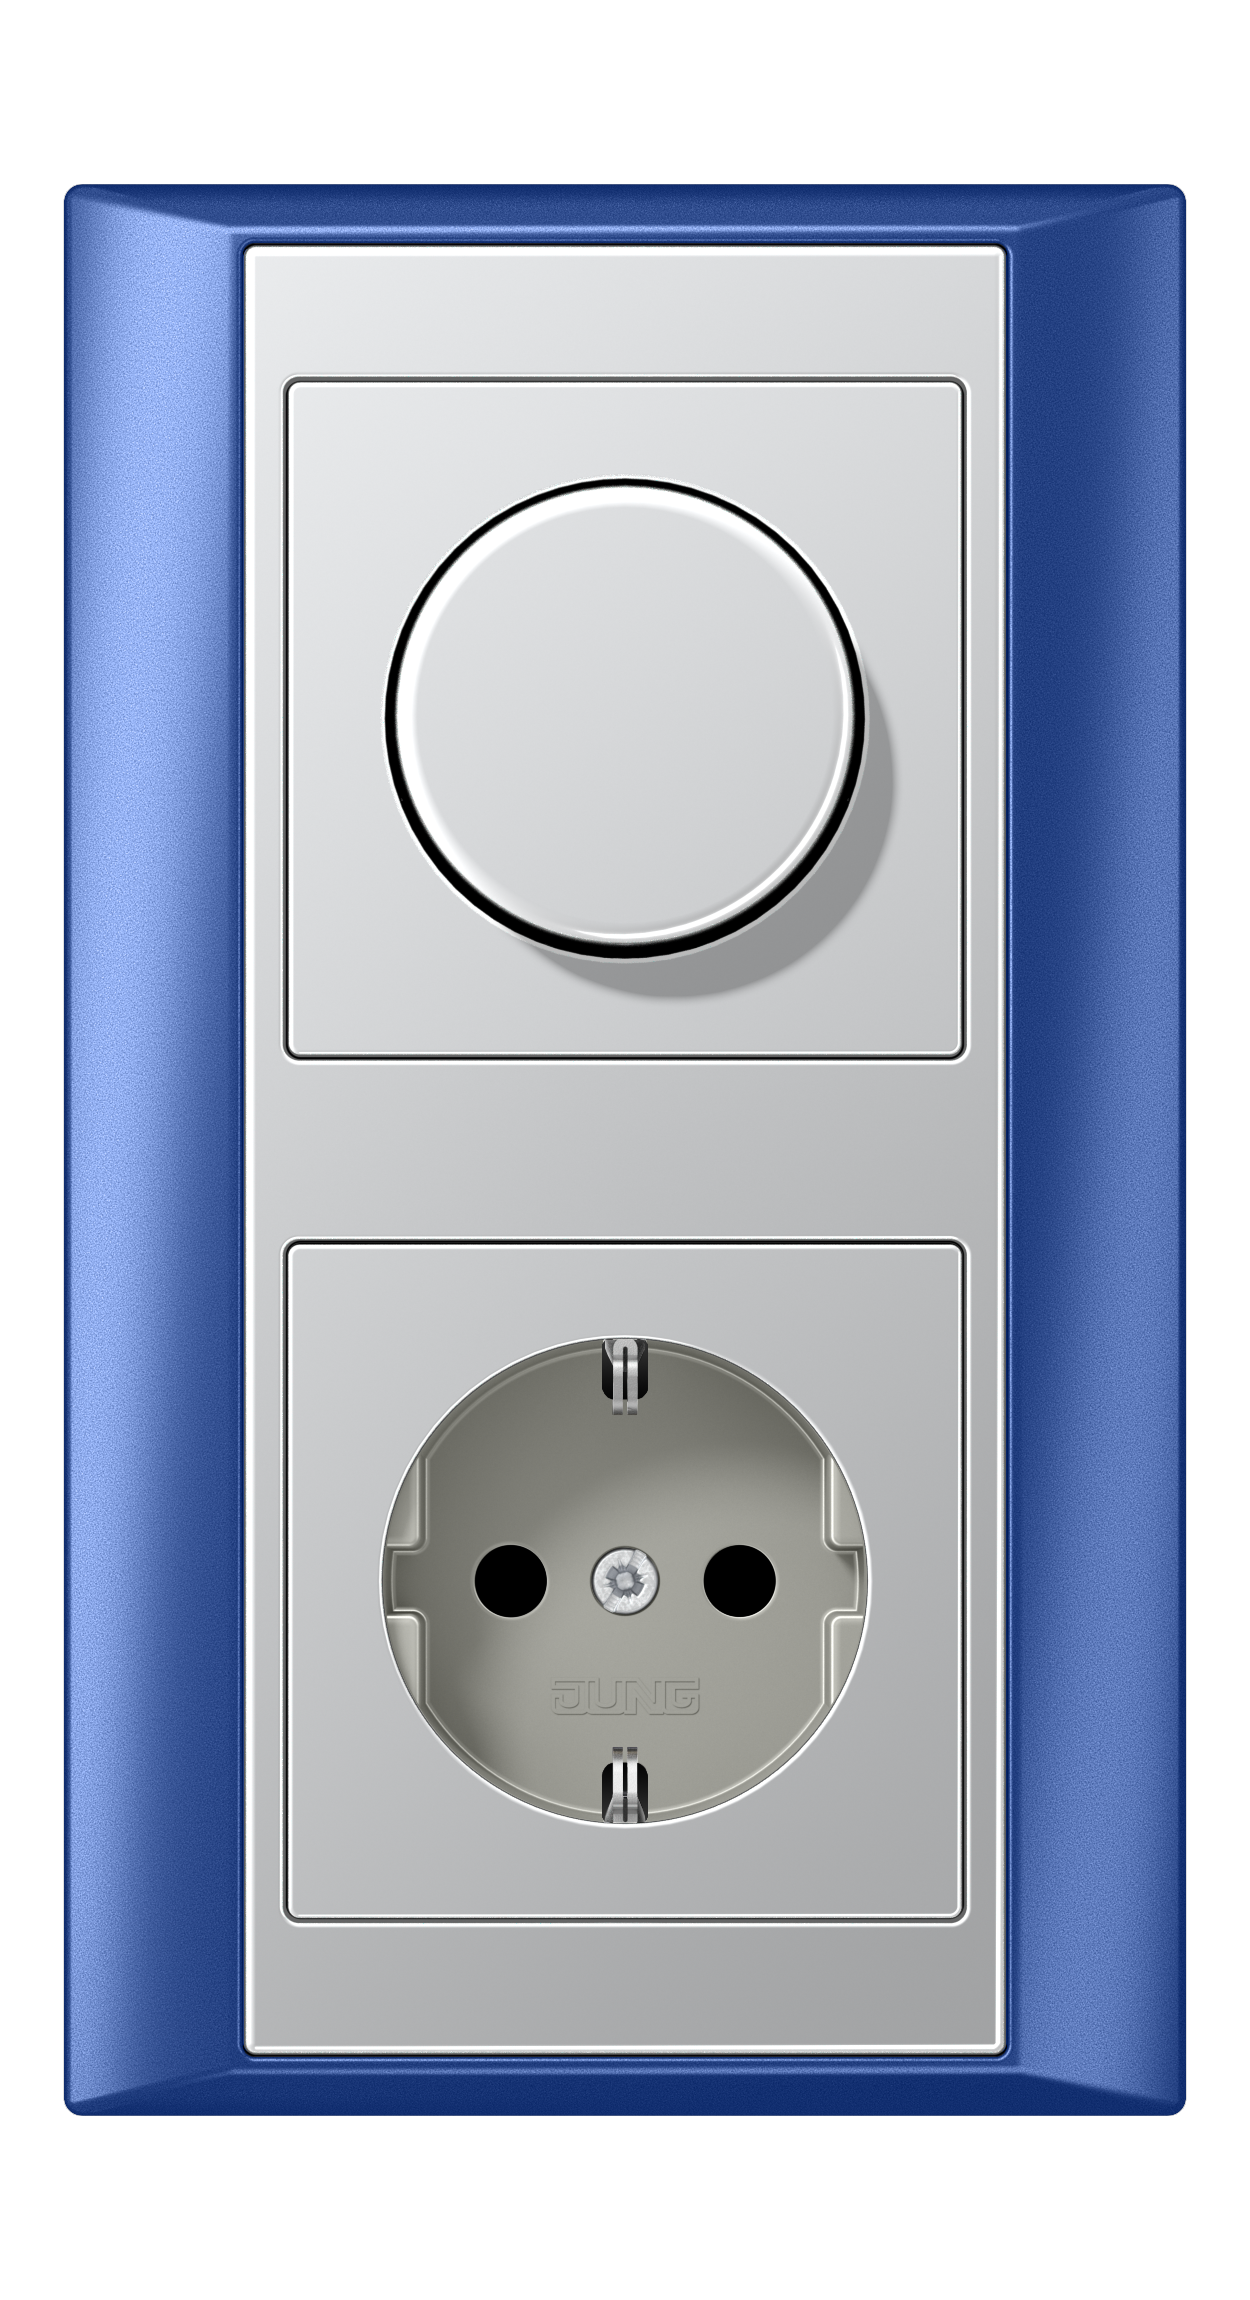 JUNG_Aplus_blue_aluminium_dimmer-socket